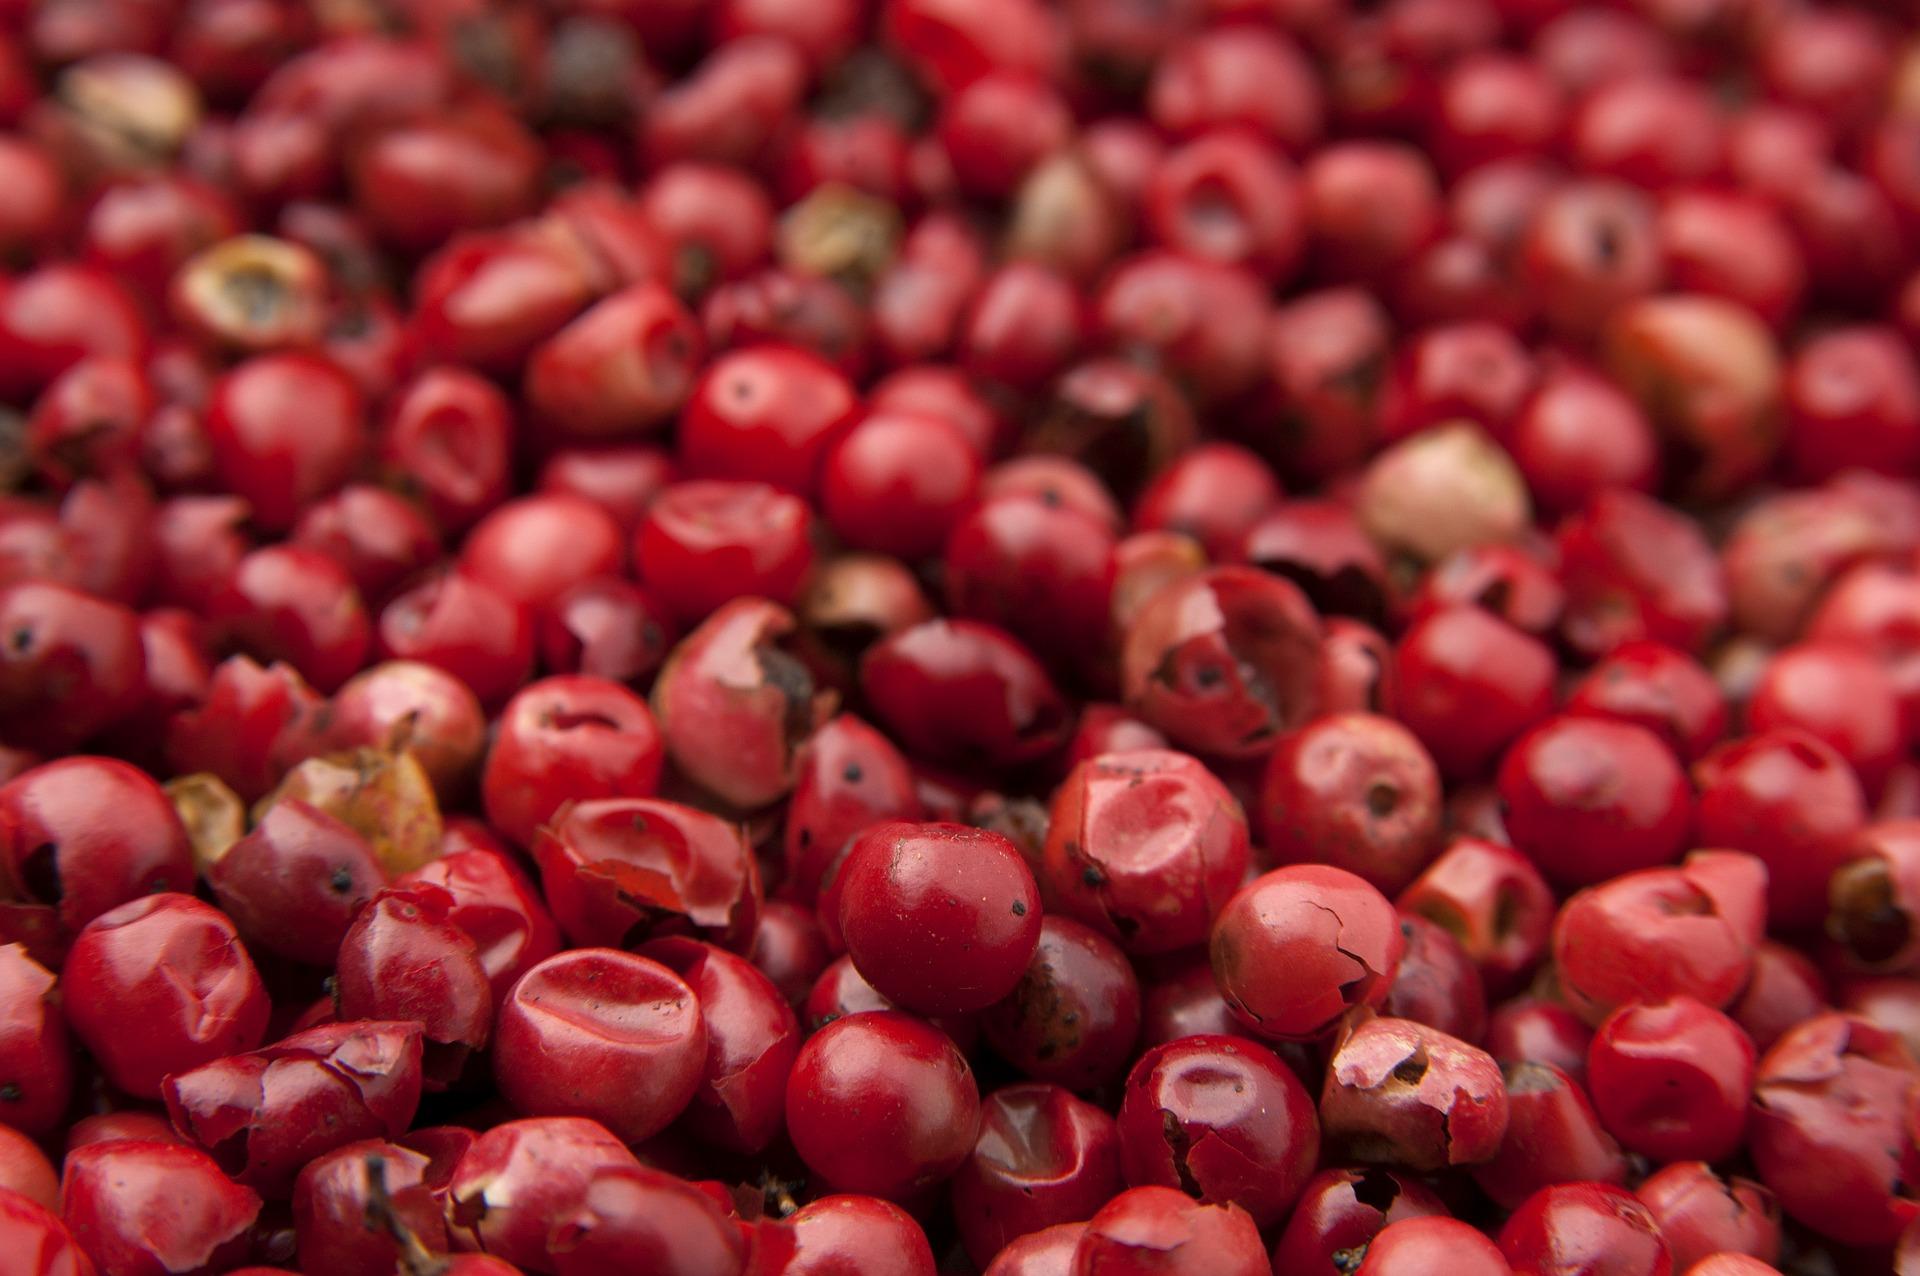 Goji berries in this shampoo has vitamins to repair damaged hair and aid in hair growth.